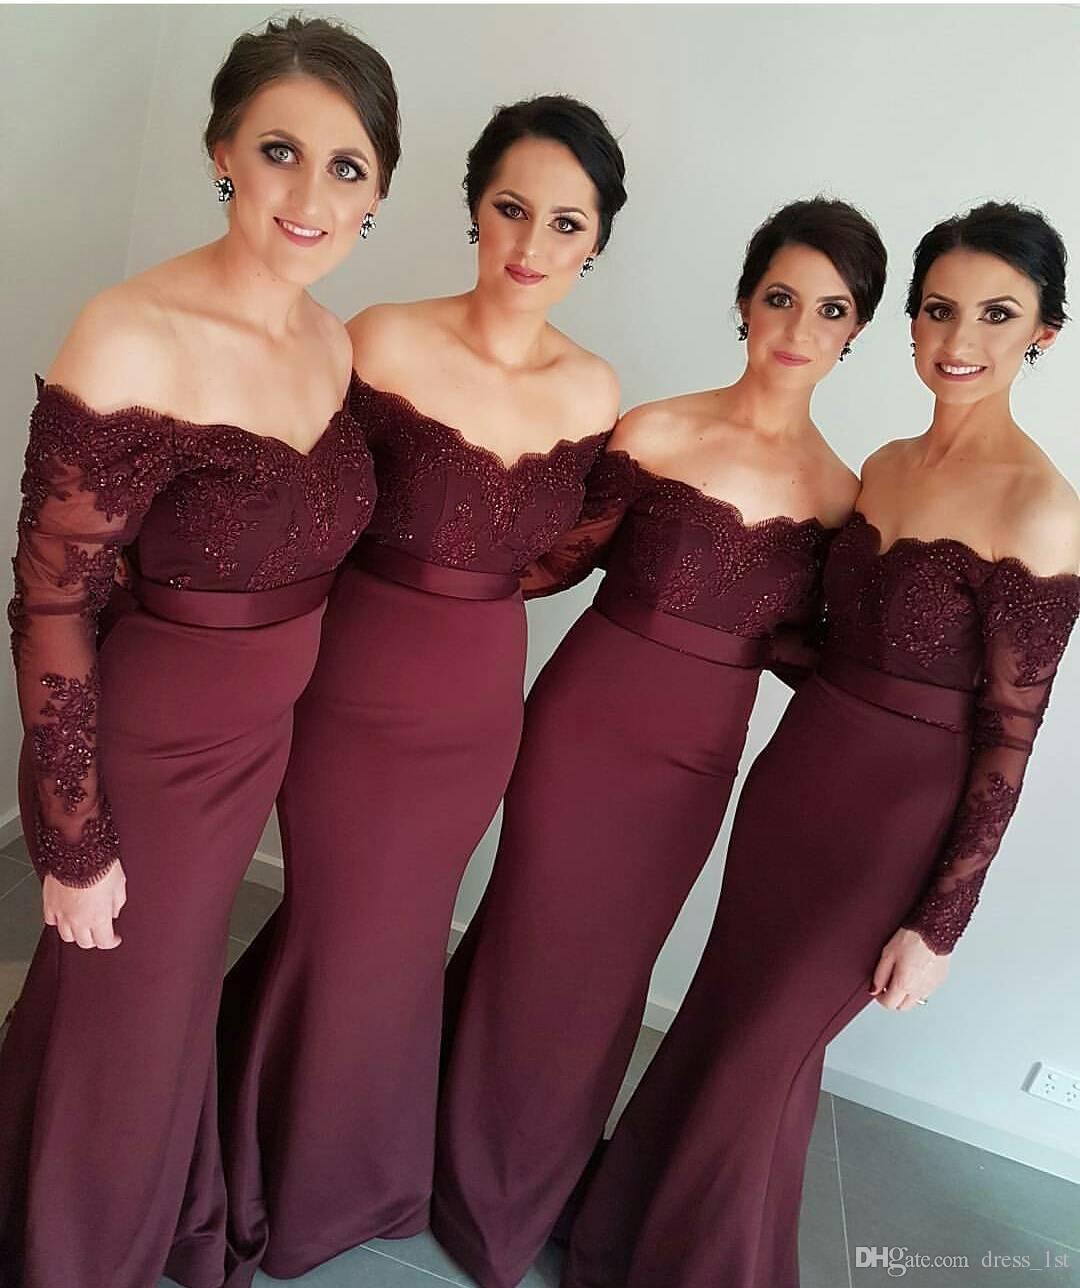 Popular 2017 Burgundy Lace Off Shoulder Illusion Long Sleeve Mermaid Bridesmaid Dresses Long Chiffon Beaded Dresses Party Evening EN10277